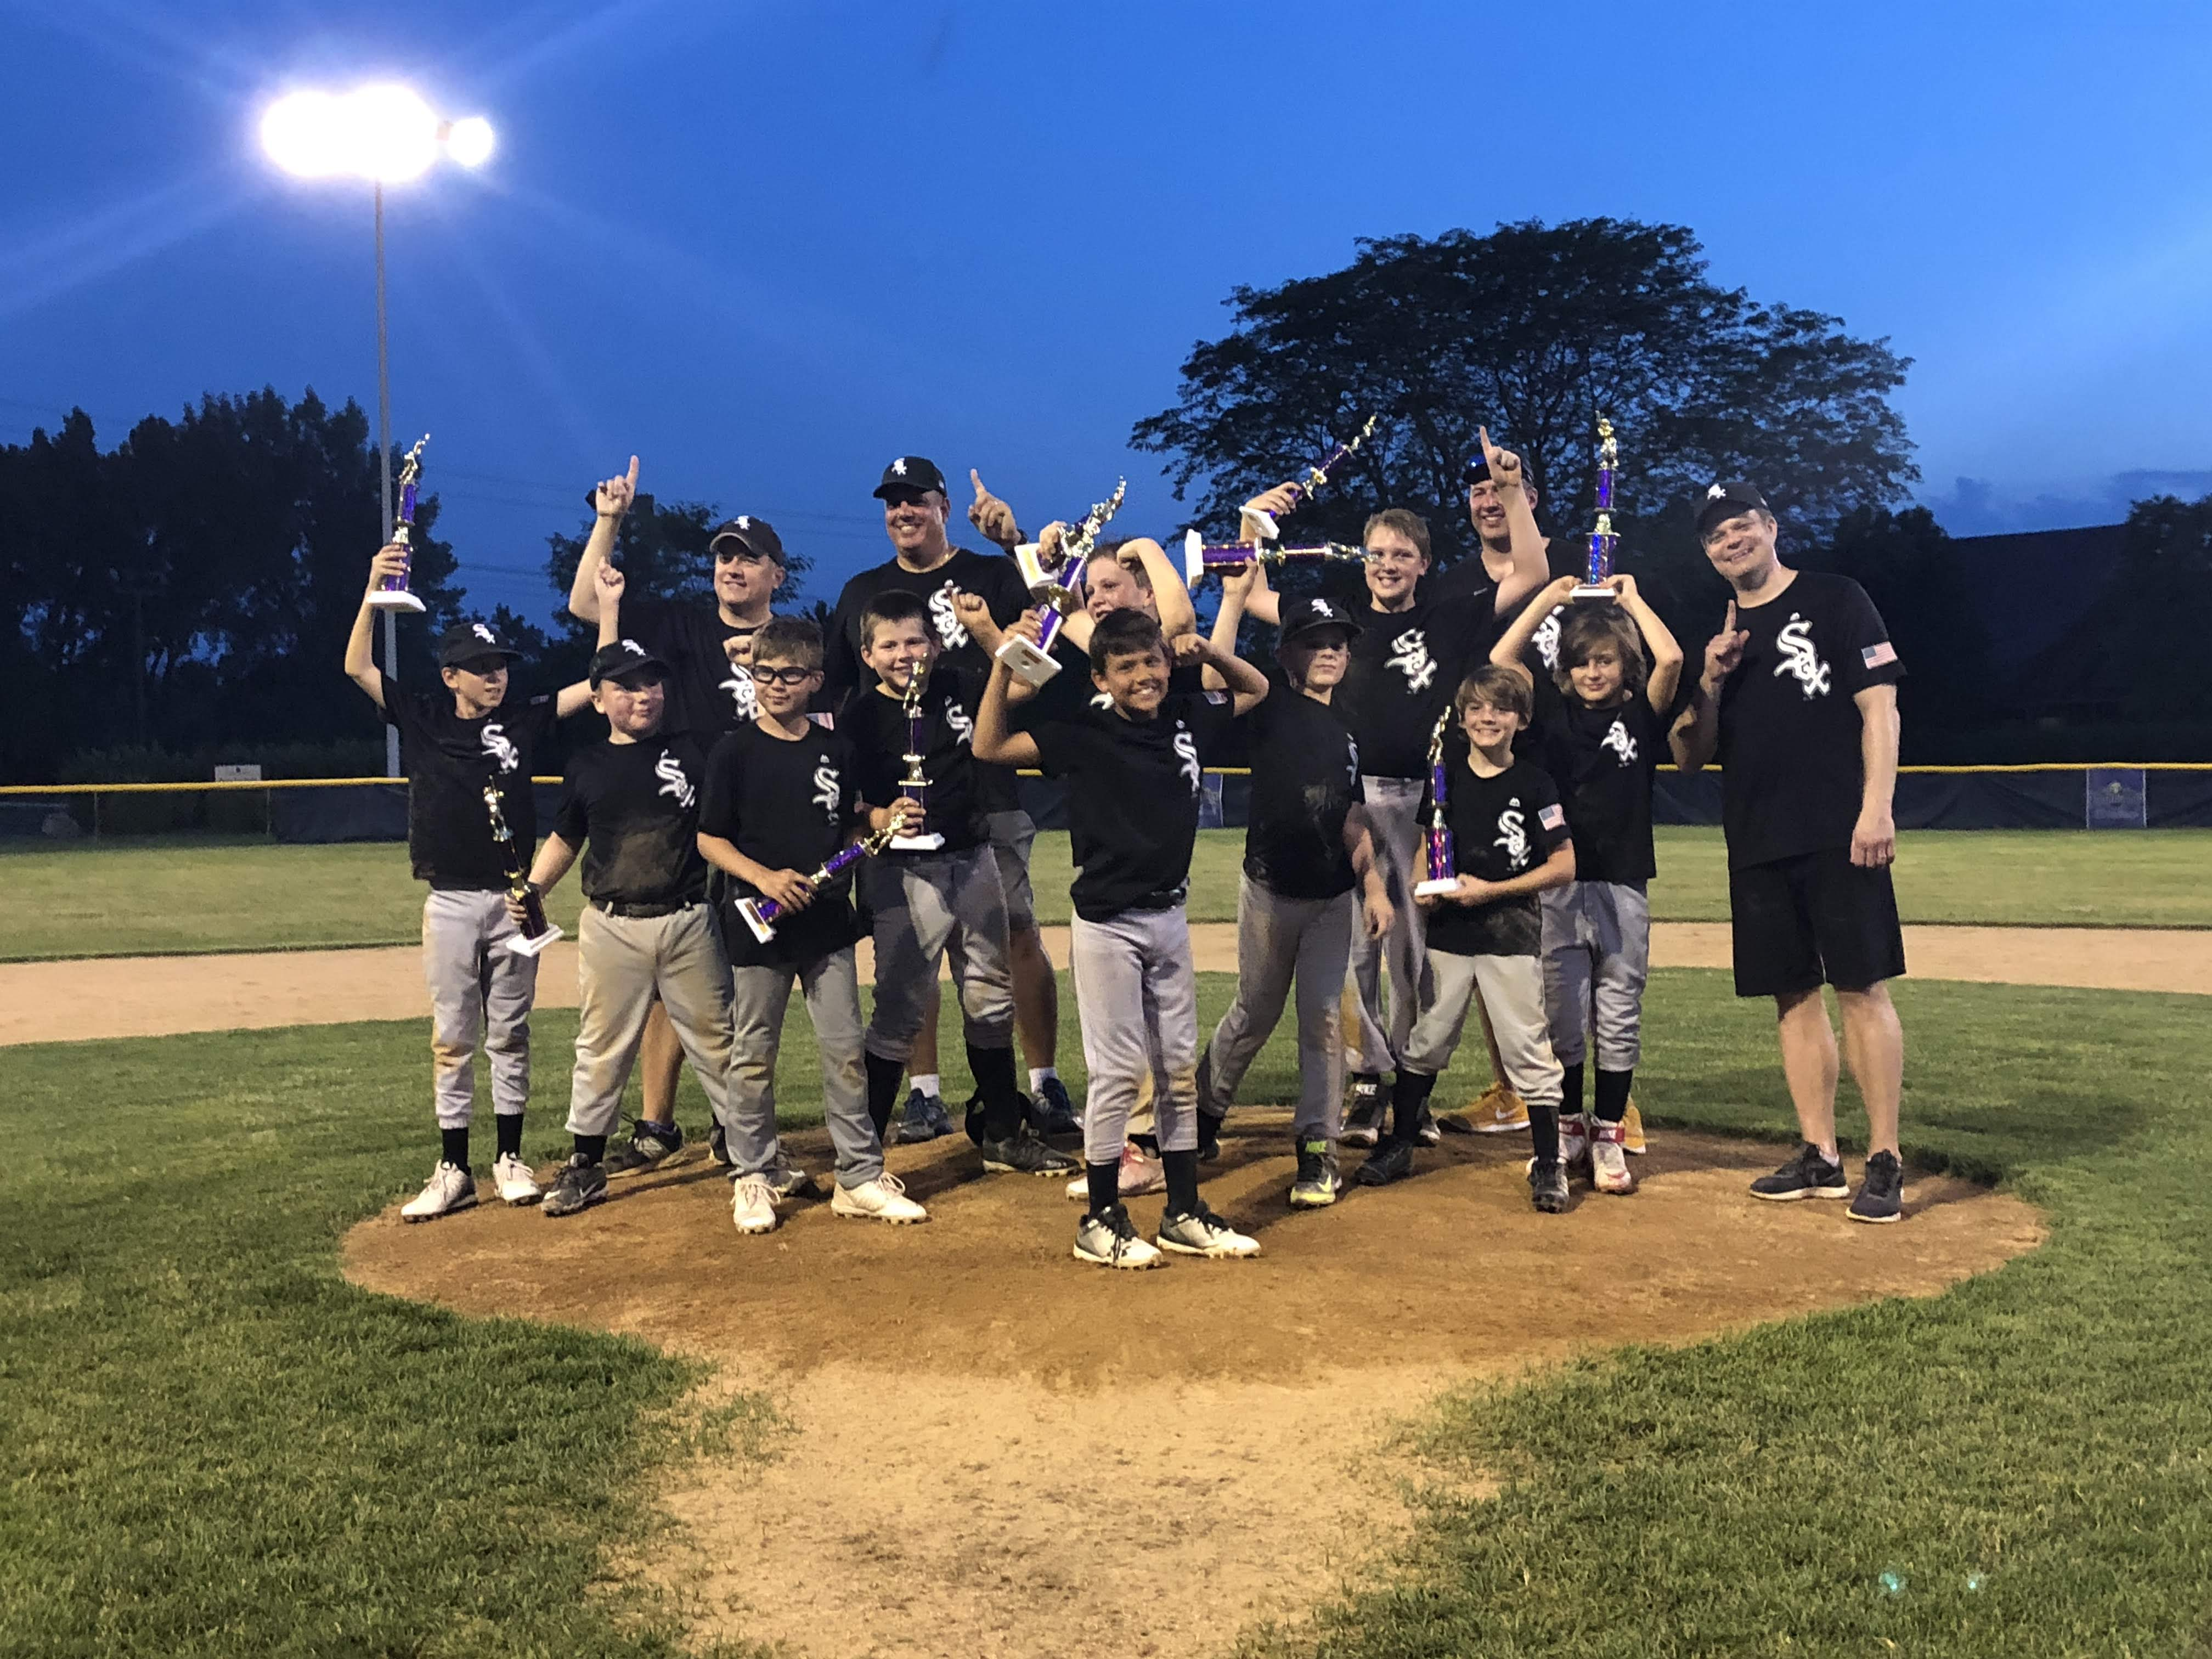 Frankfort Boys Baseball Inc